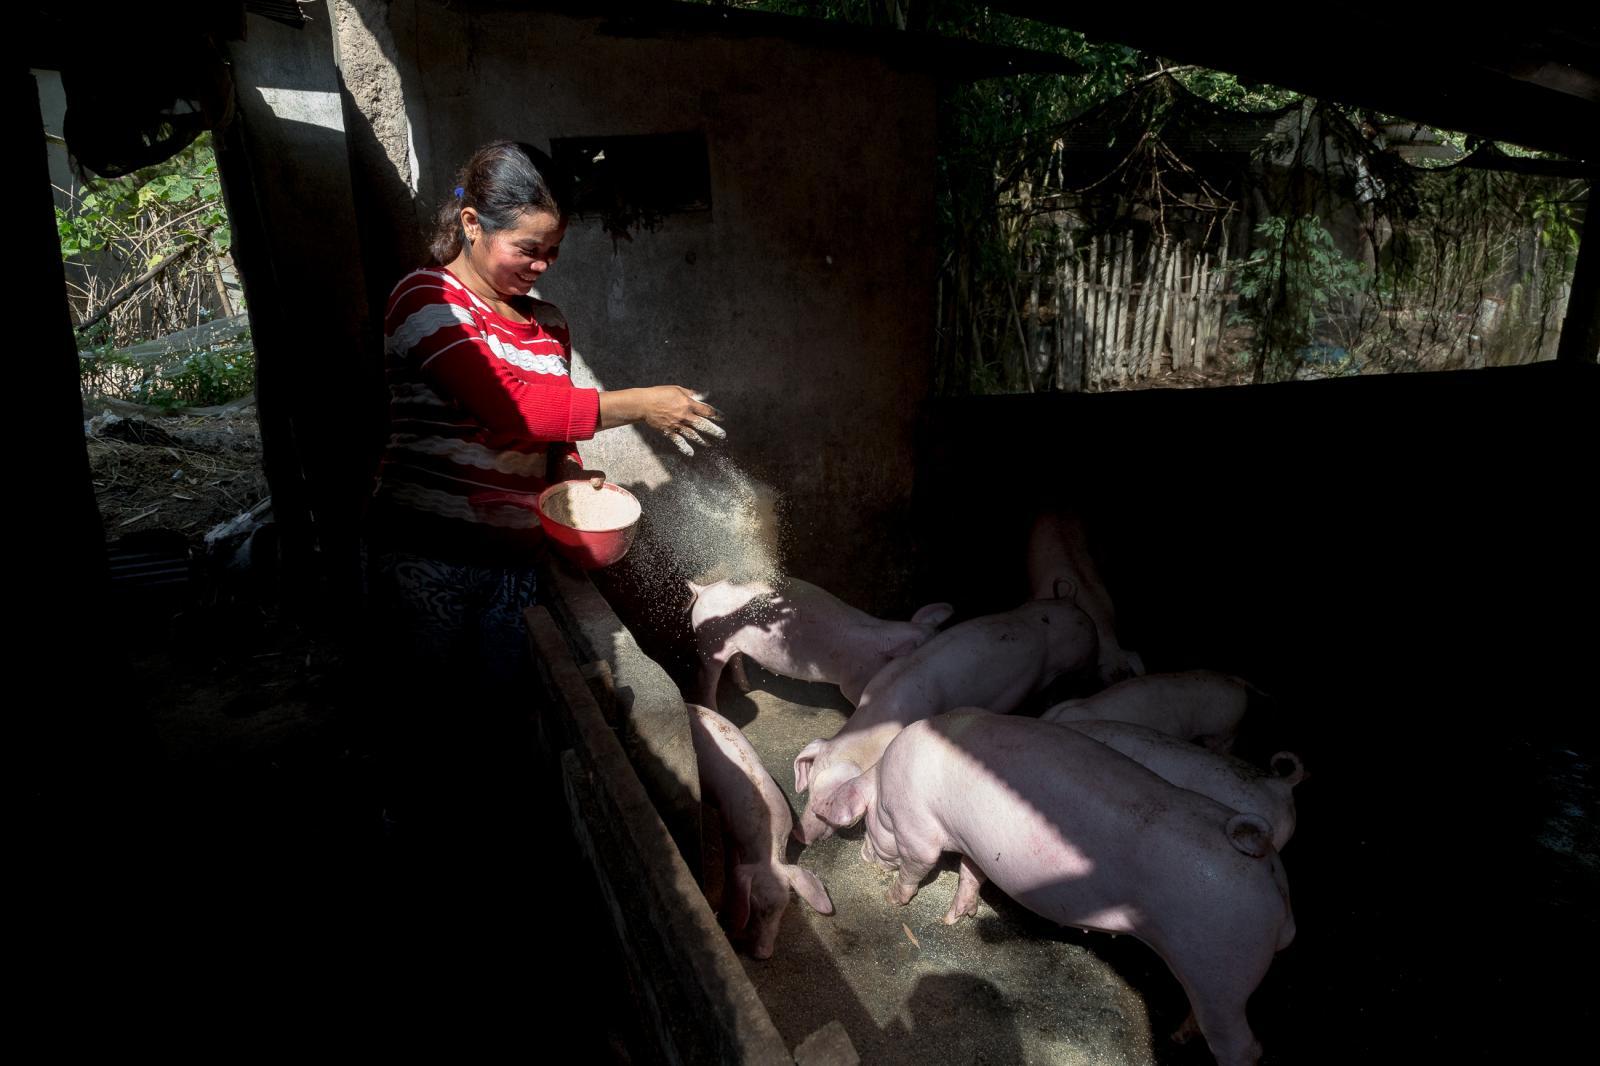 Photography image - Loading 001_Portfolio-Food-NGO-Omar-Havana.jpg